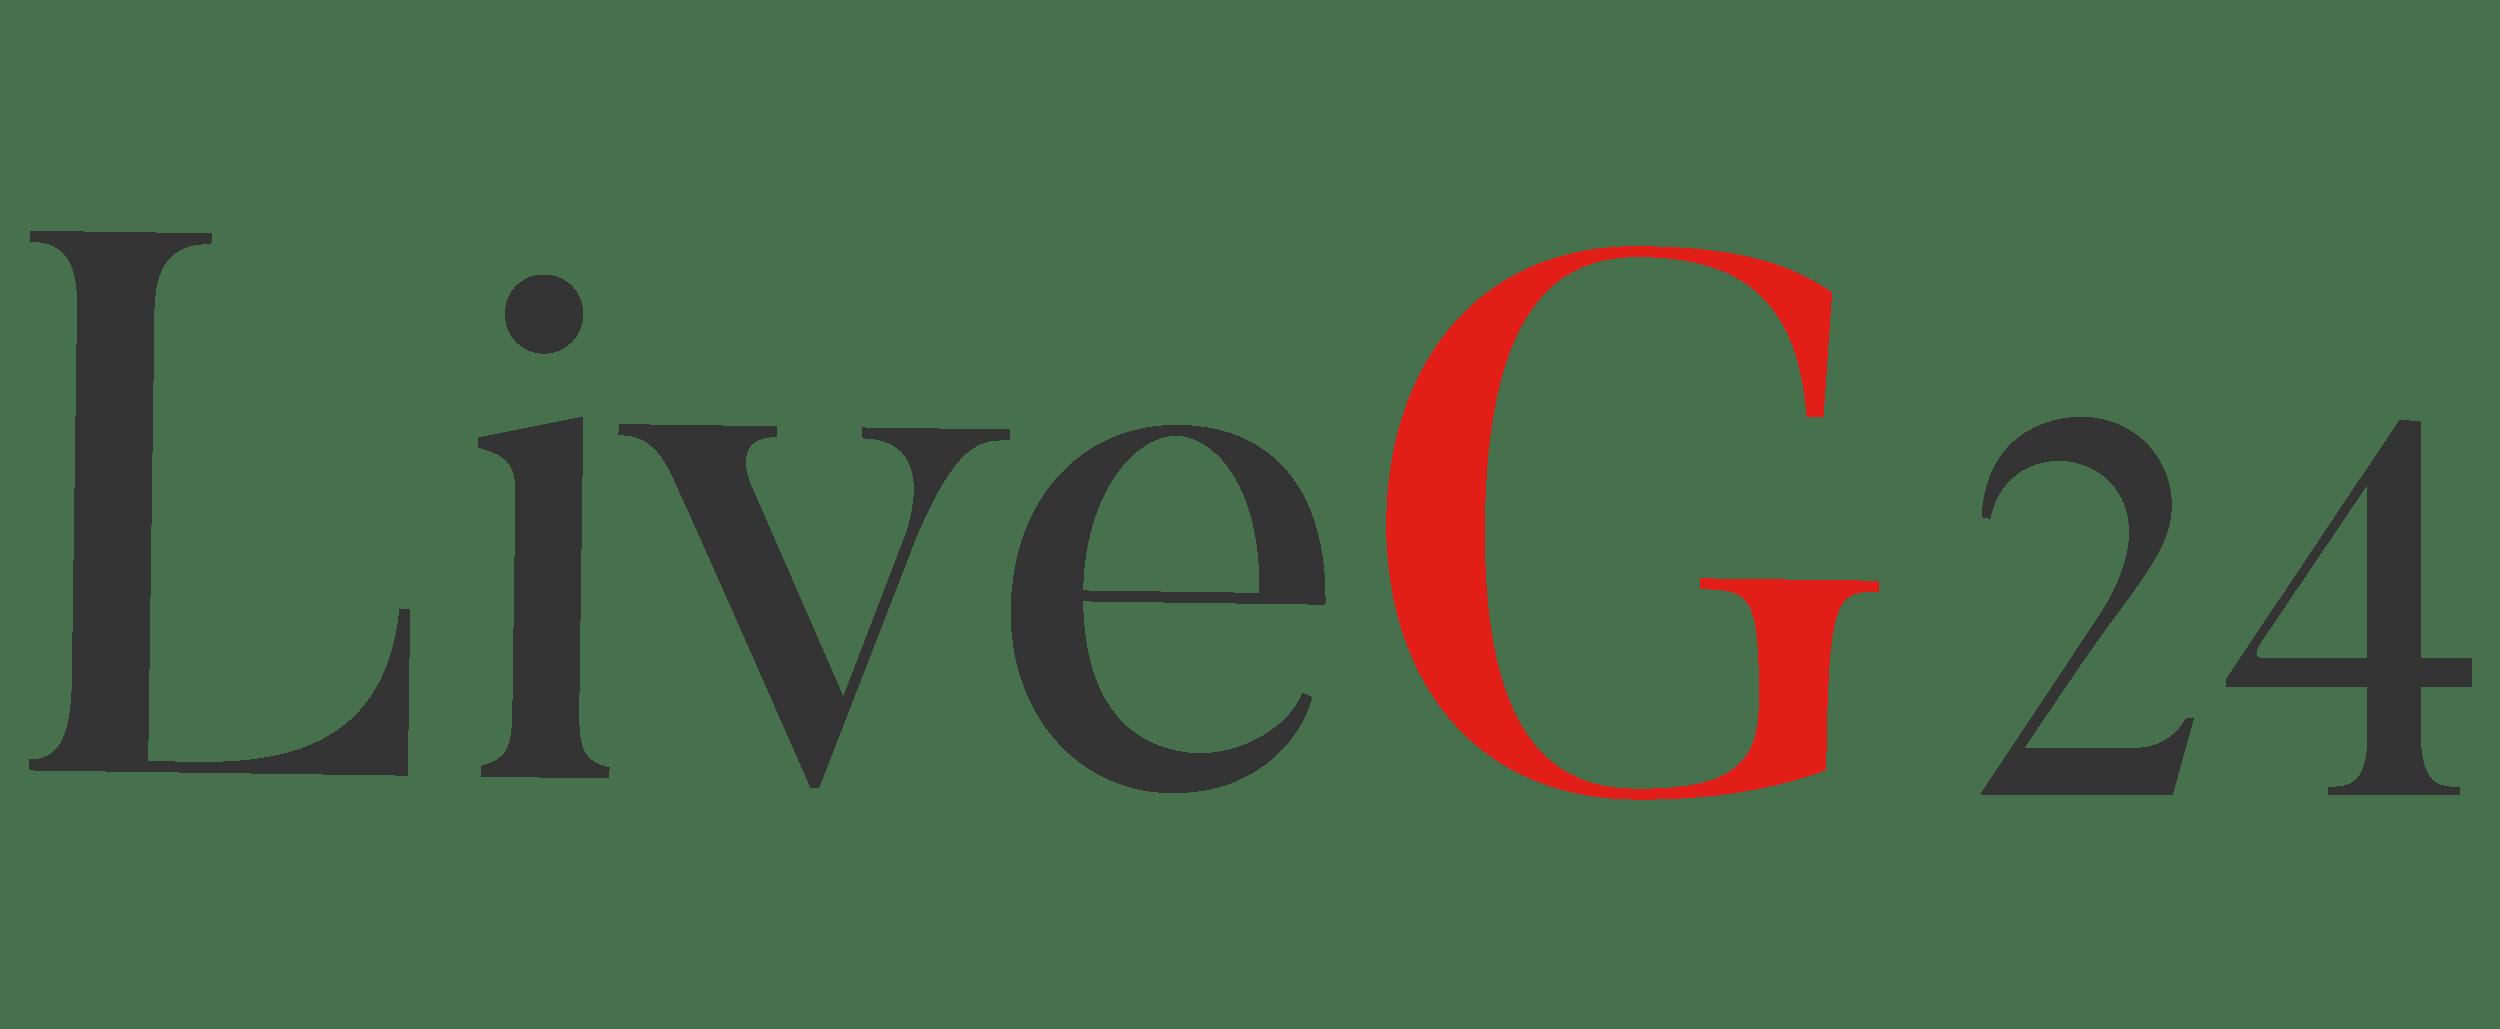 LiveG24 (ранее Medialive Casino) игры